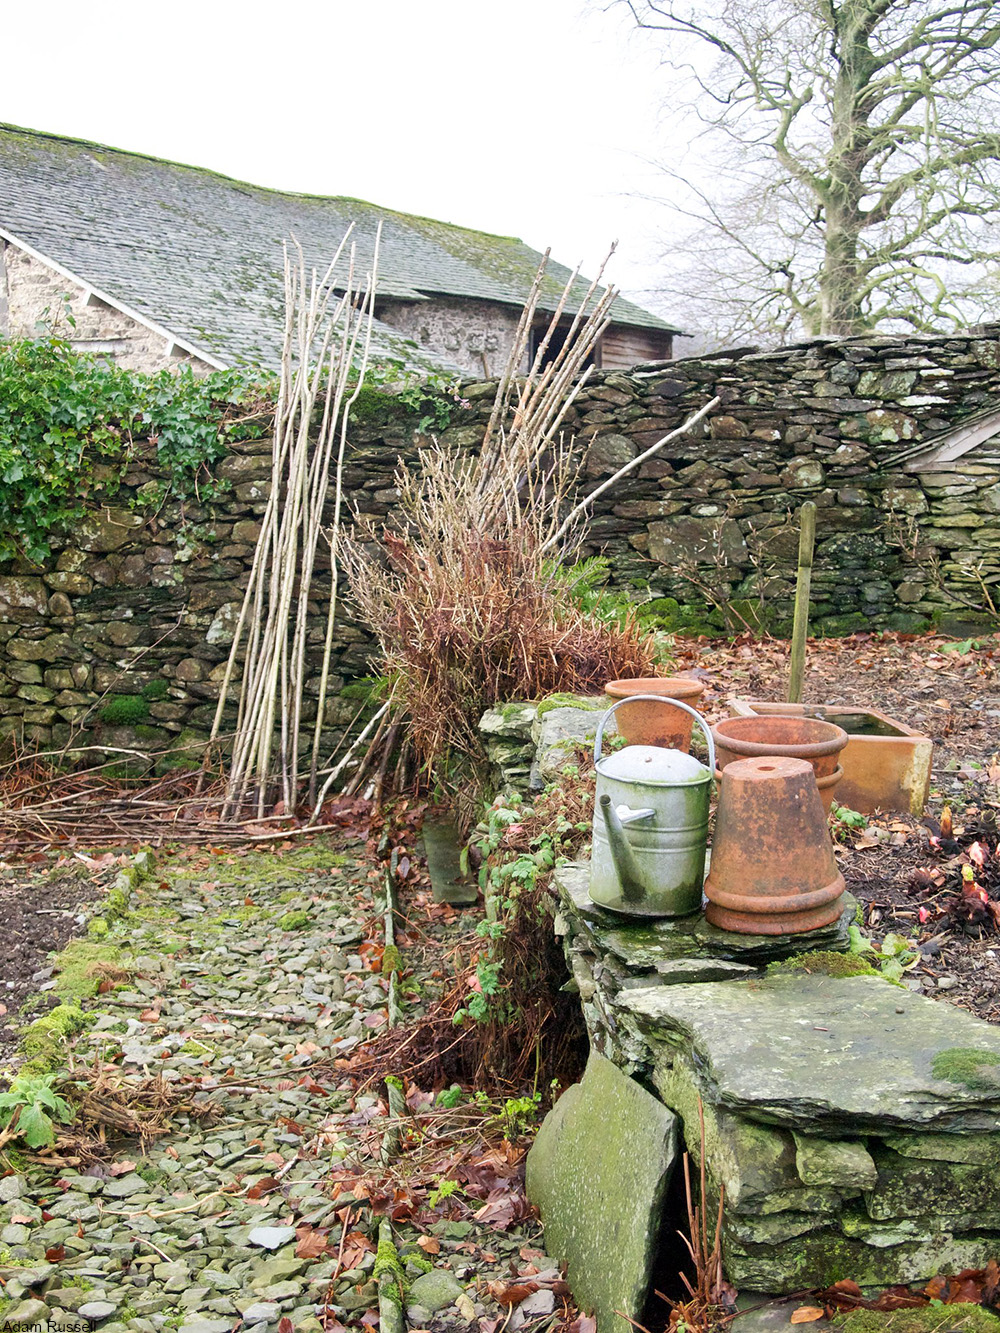 Hill Top garden, Cumbria, UK